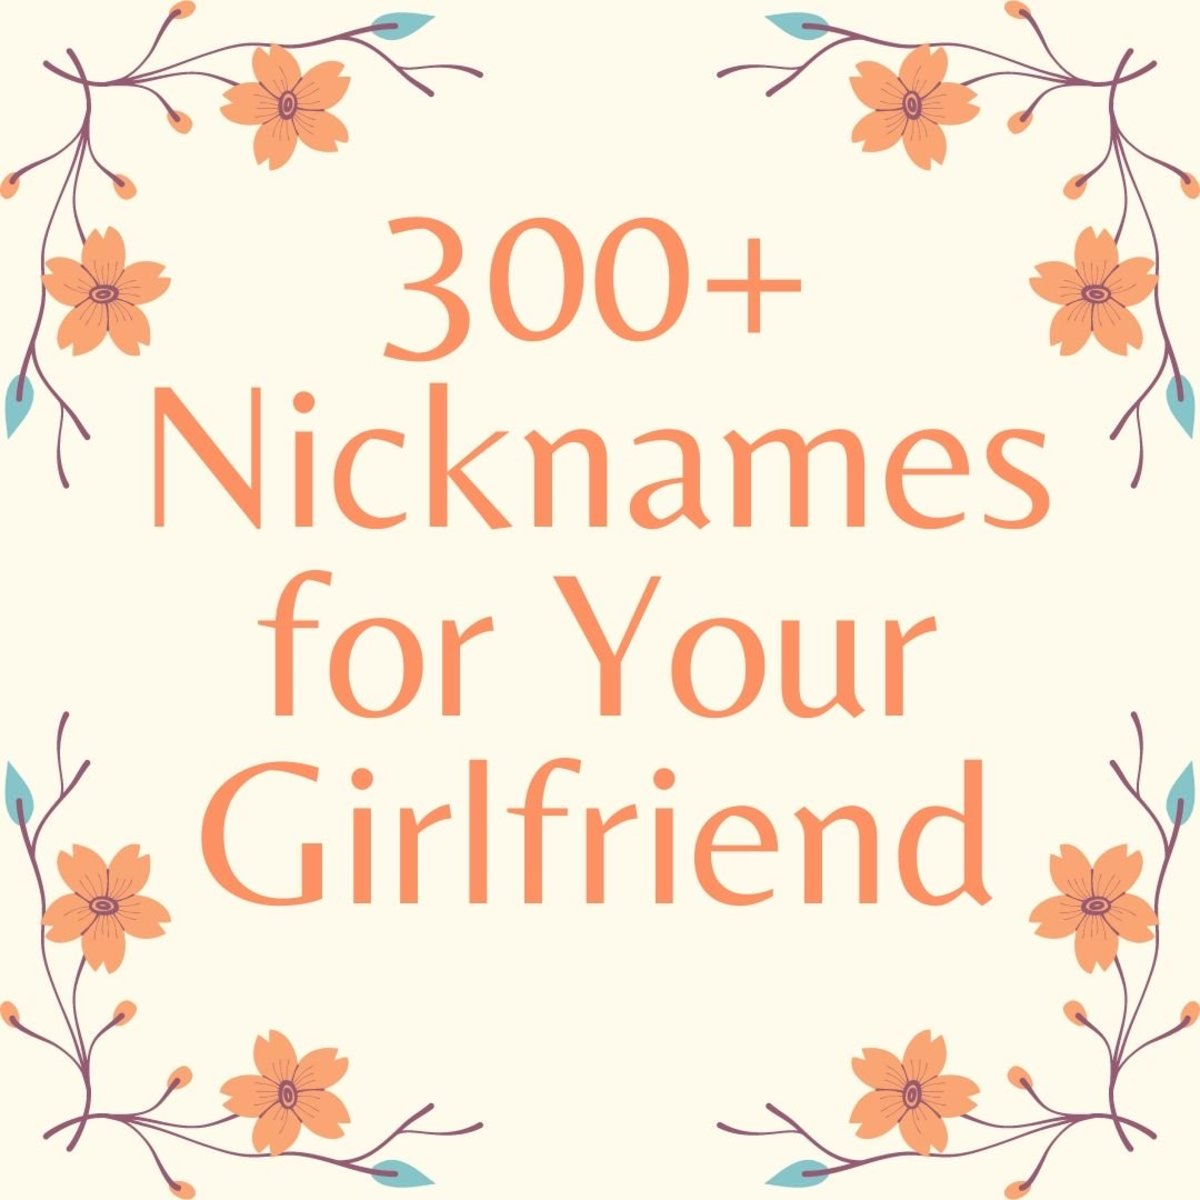 nicknames-for-girlfriend